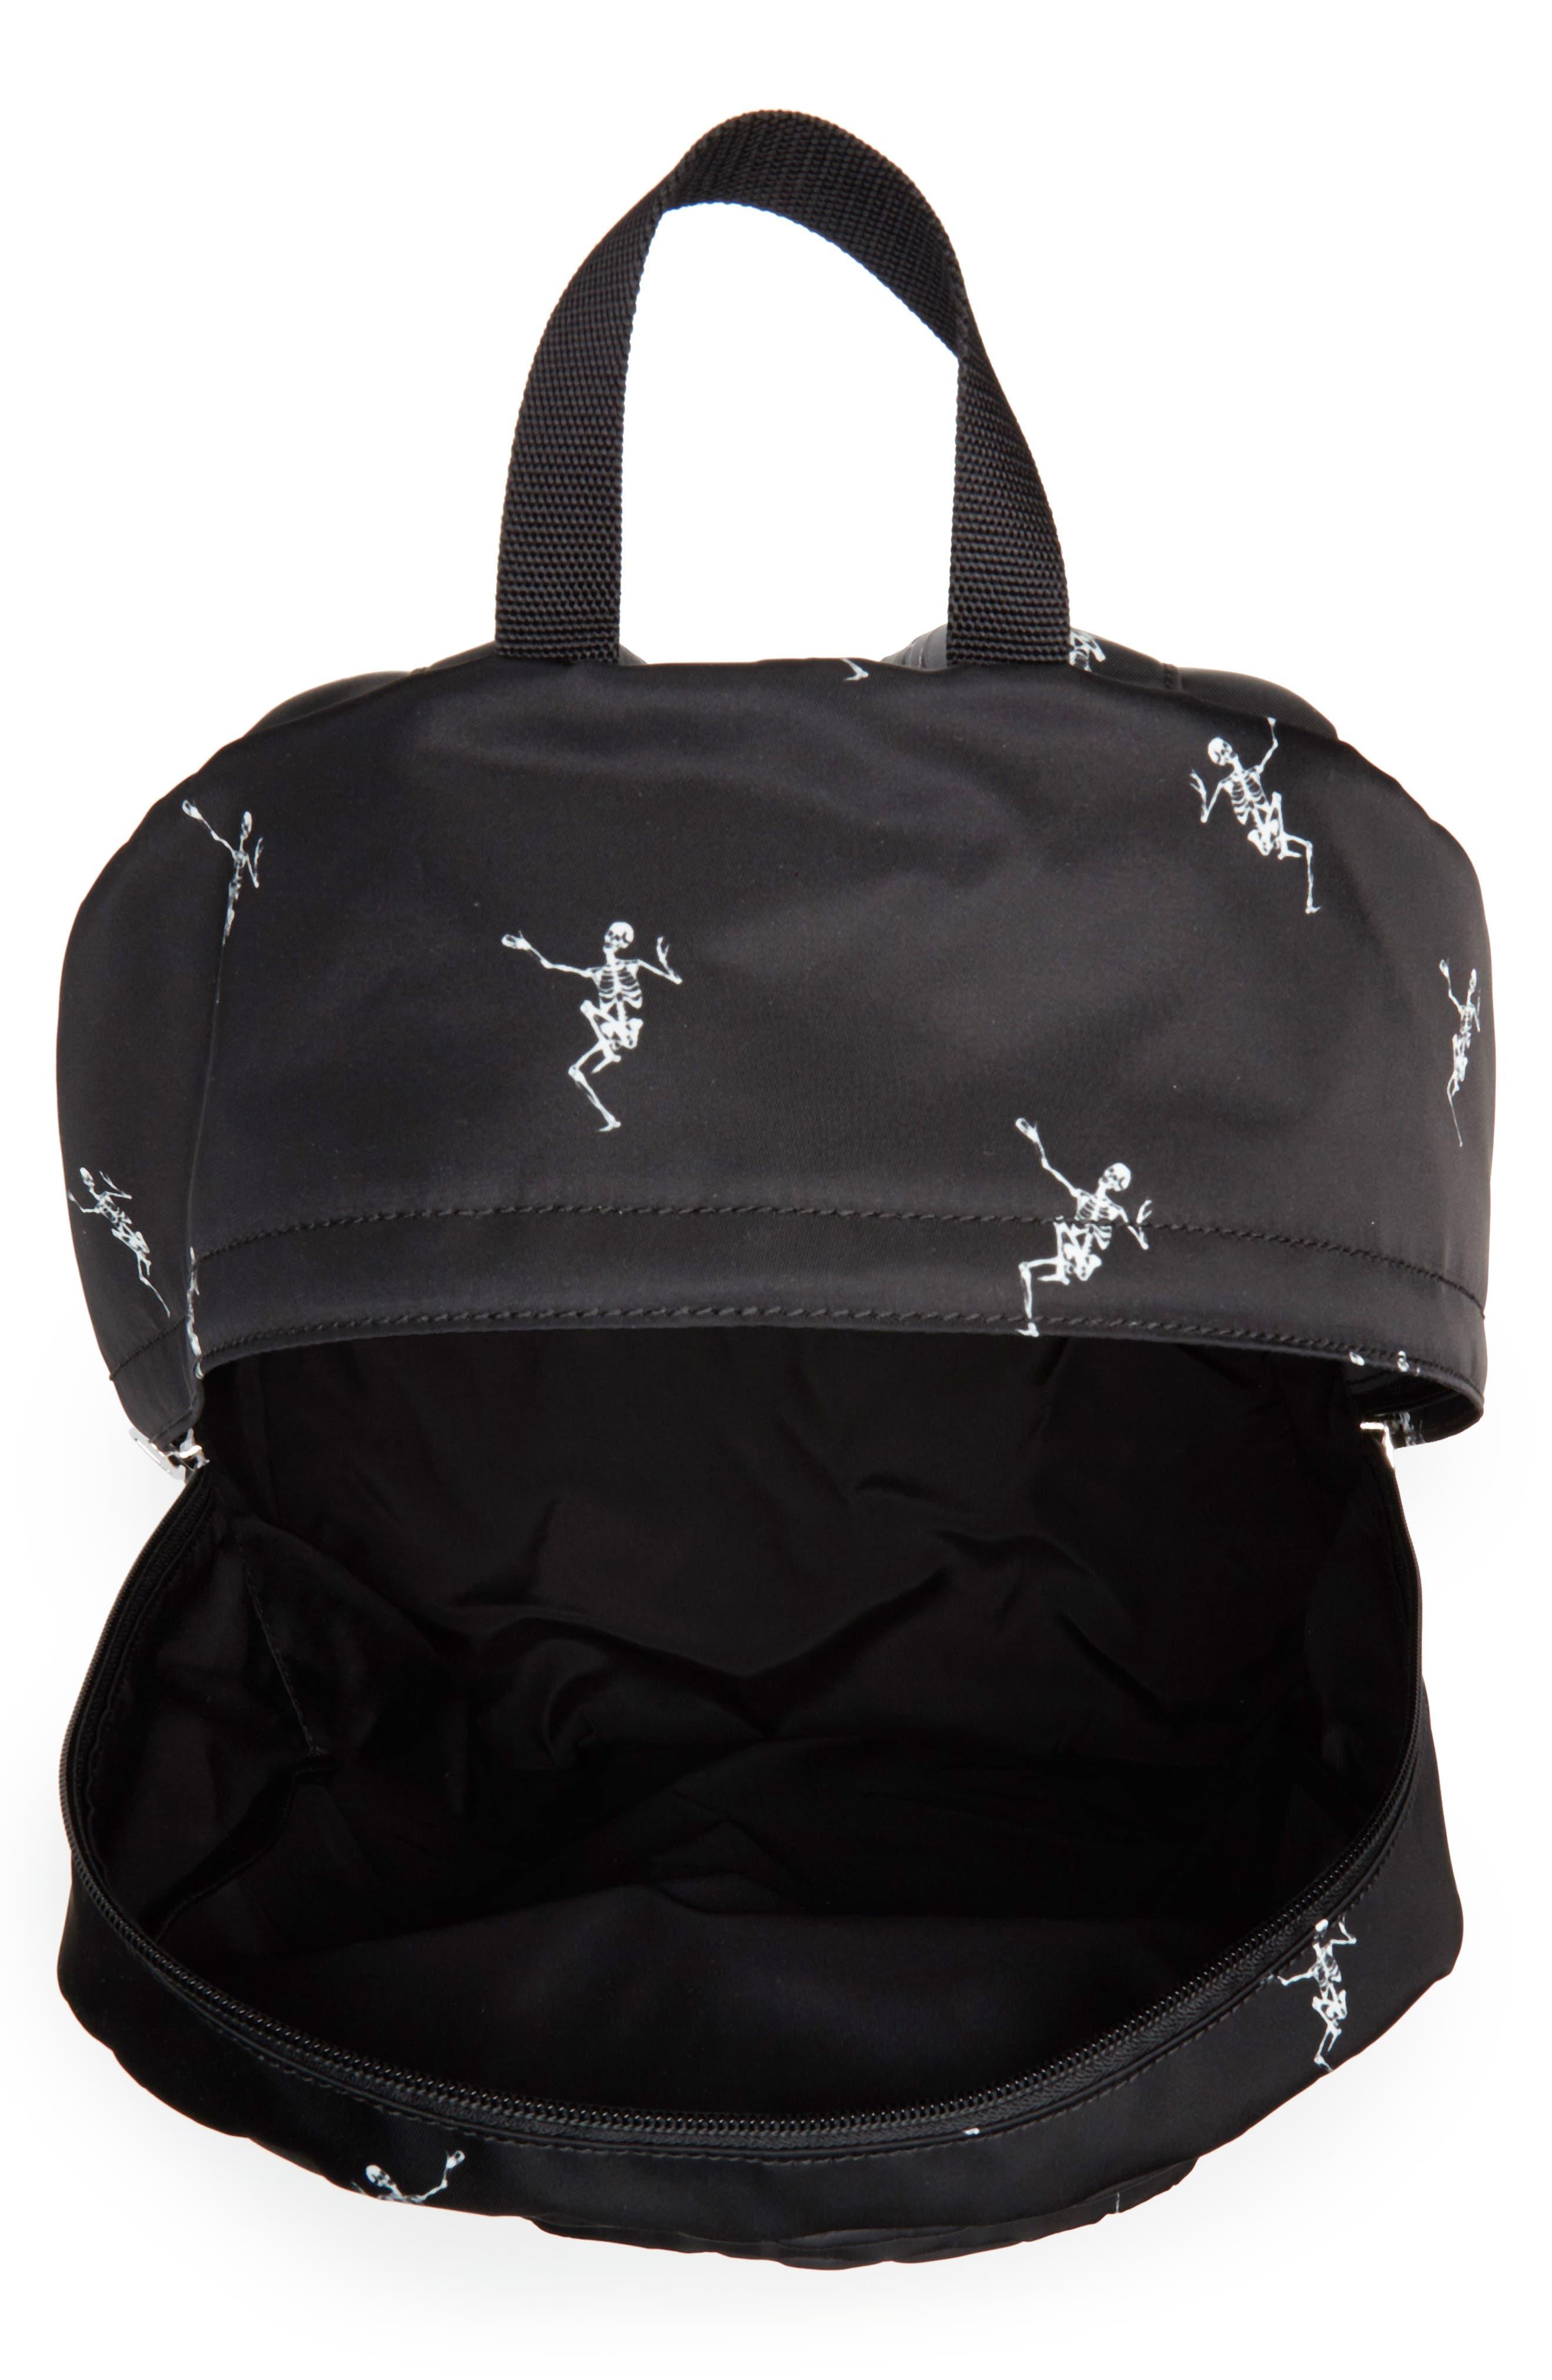 Dancing Skeleton Backpack,                             Alternate thumbnail 4, color,                             BLACK/ OFF WHITE